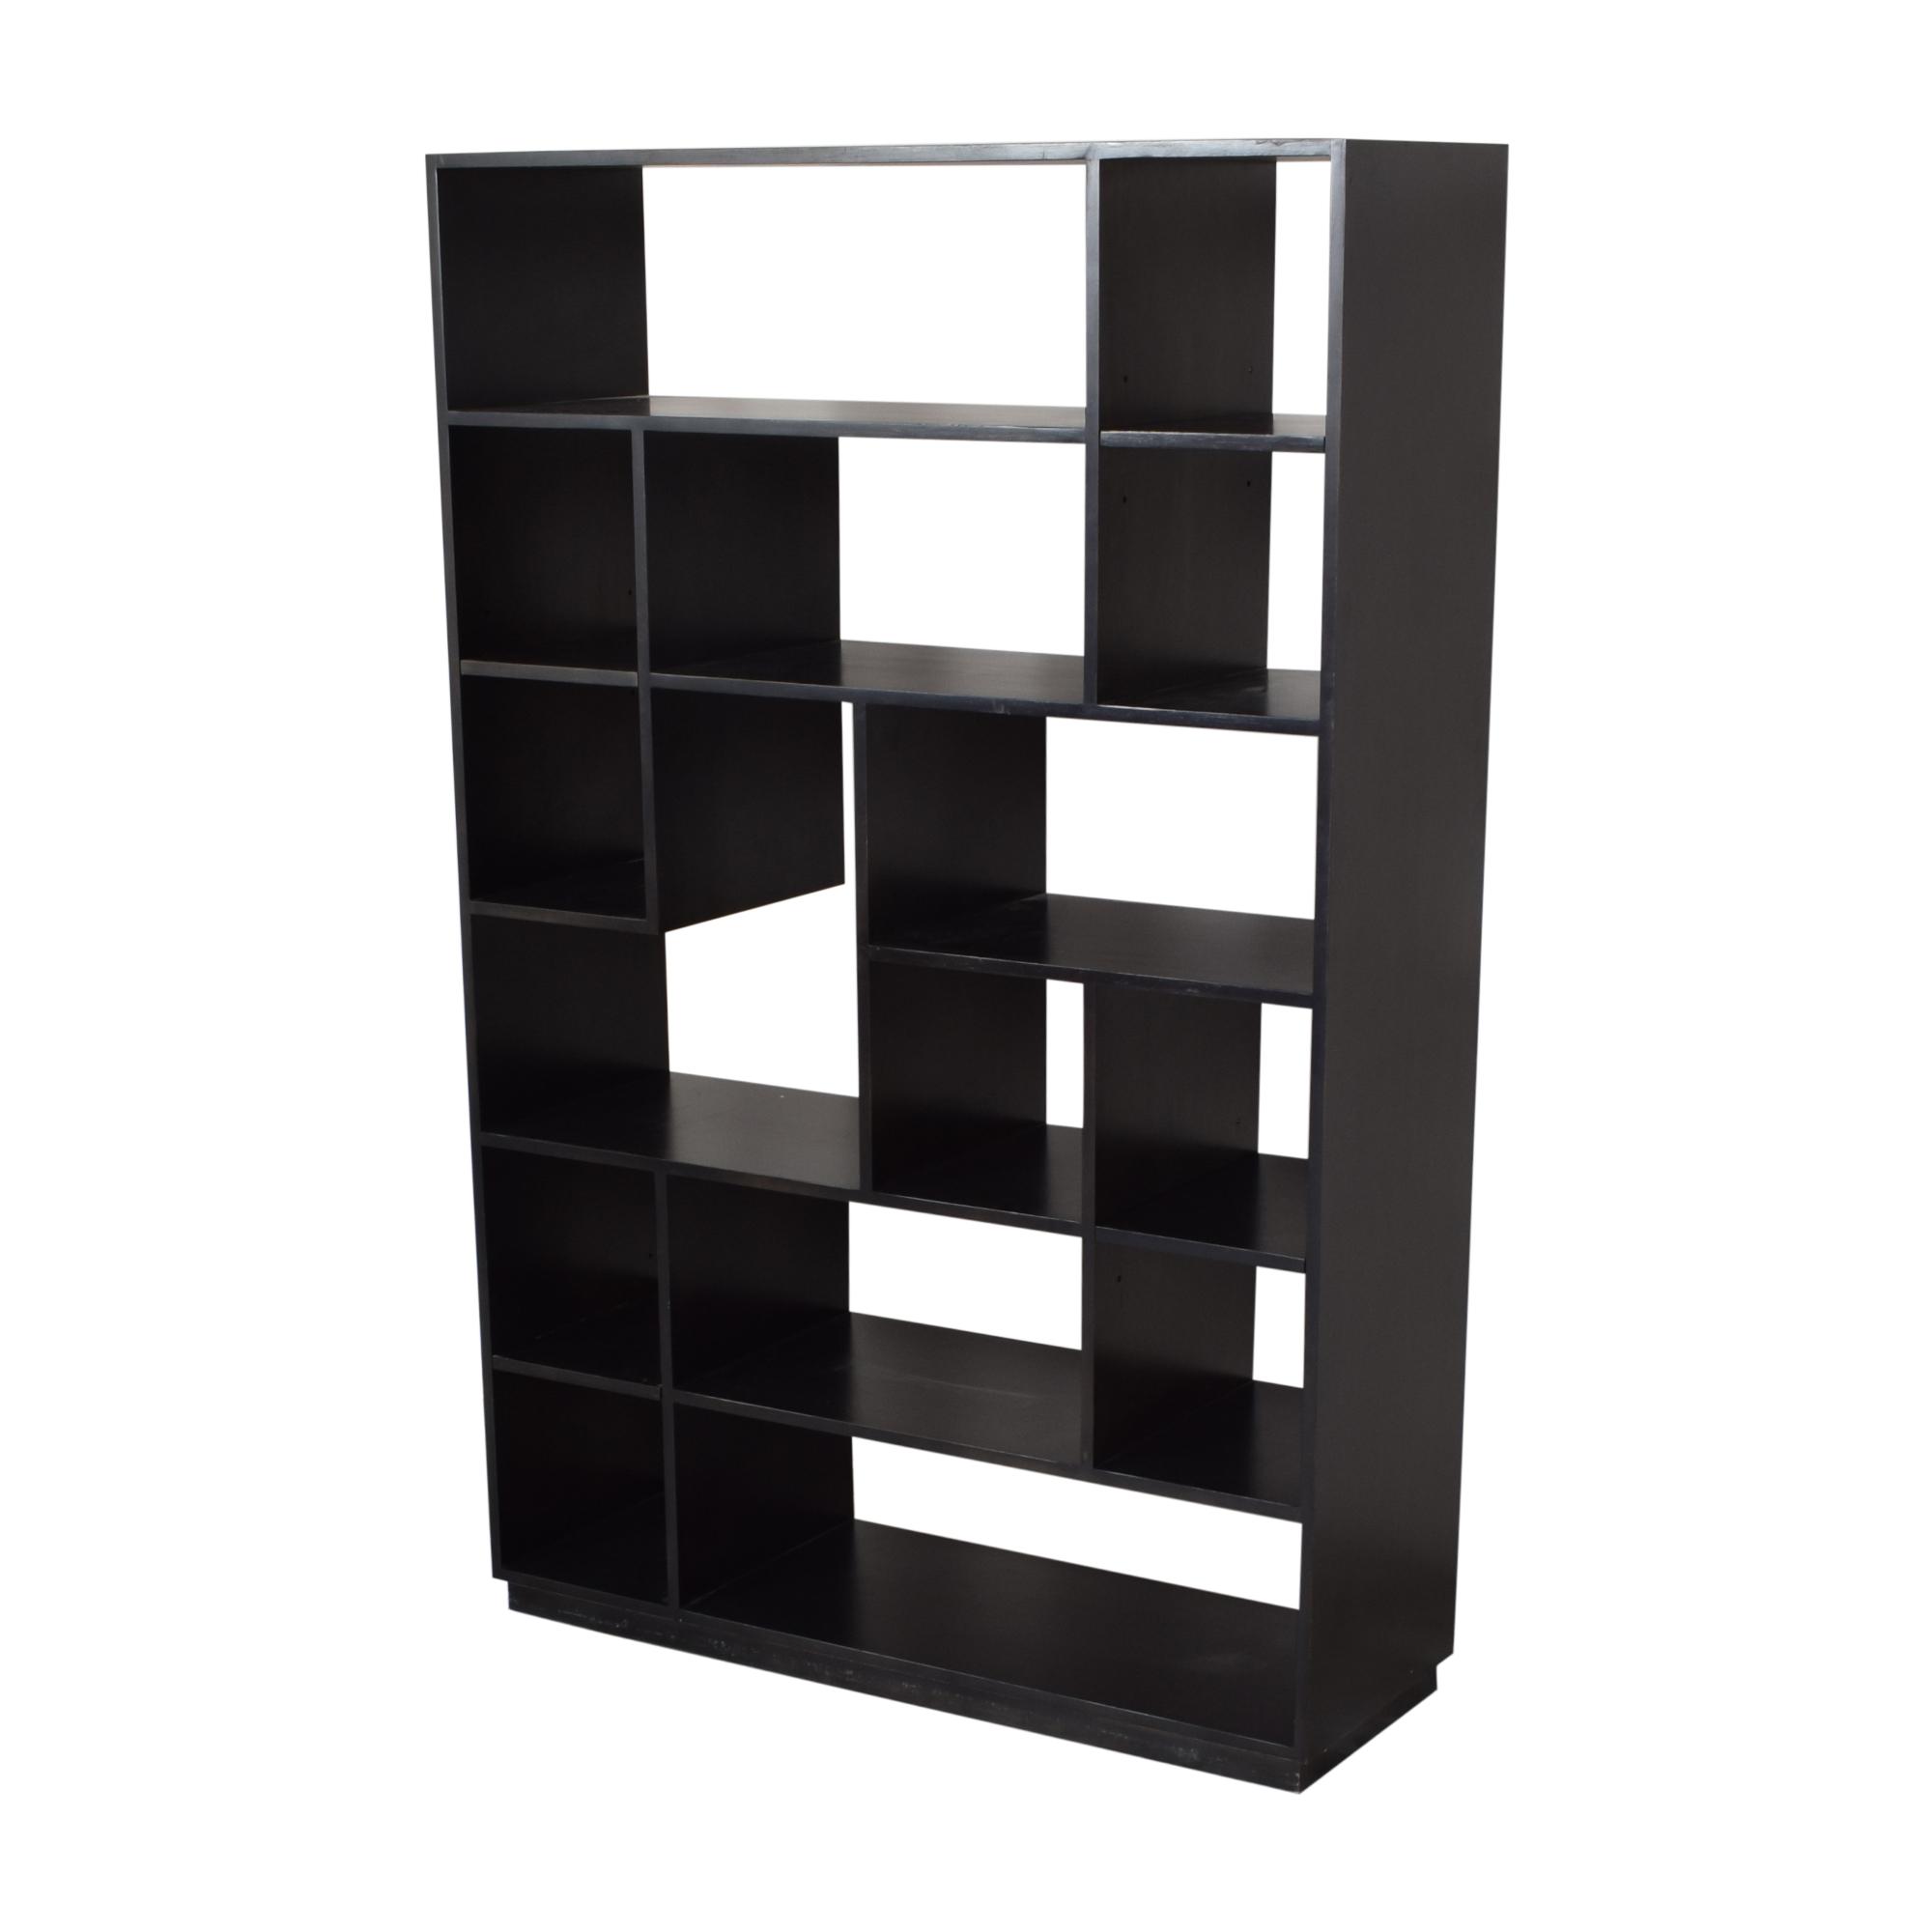 buy Room & Board Room & Board by Maria Yee Bookcase online